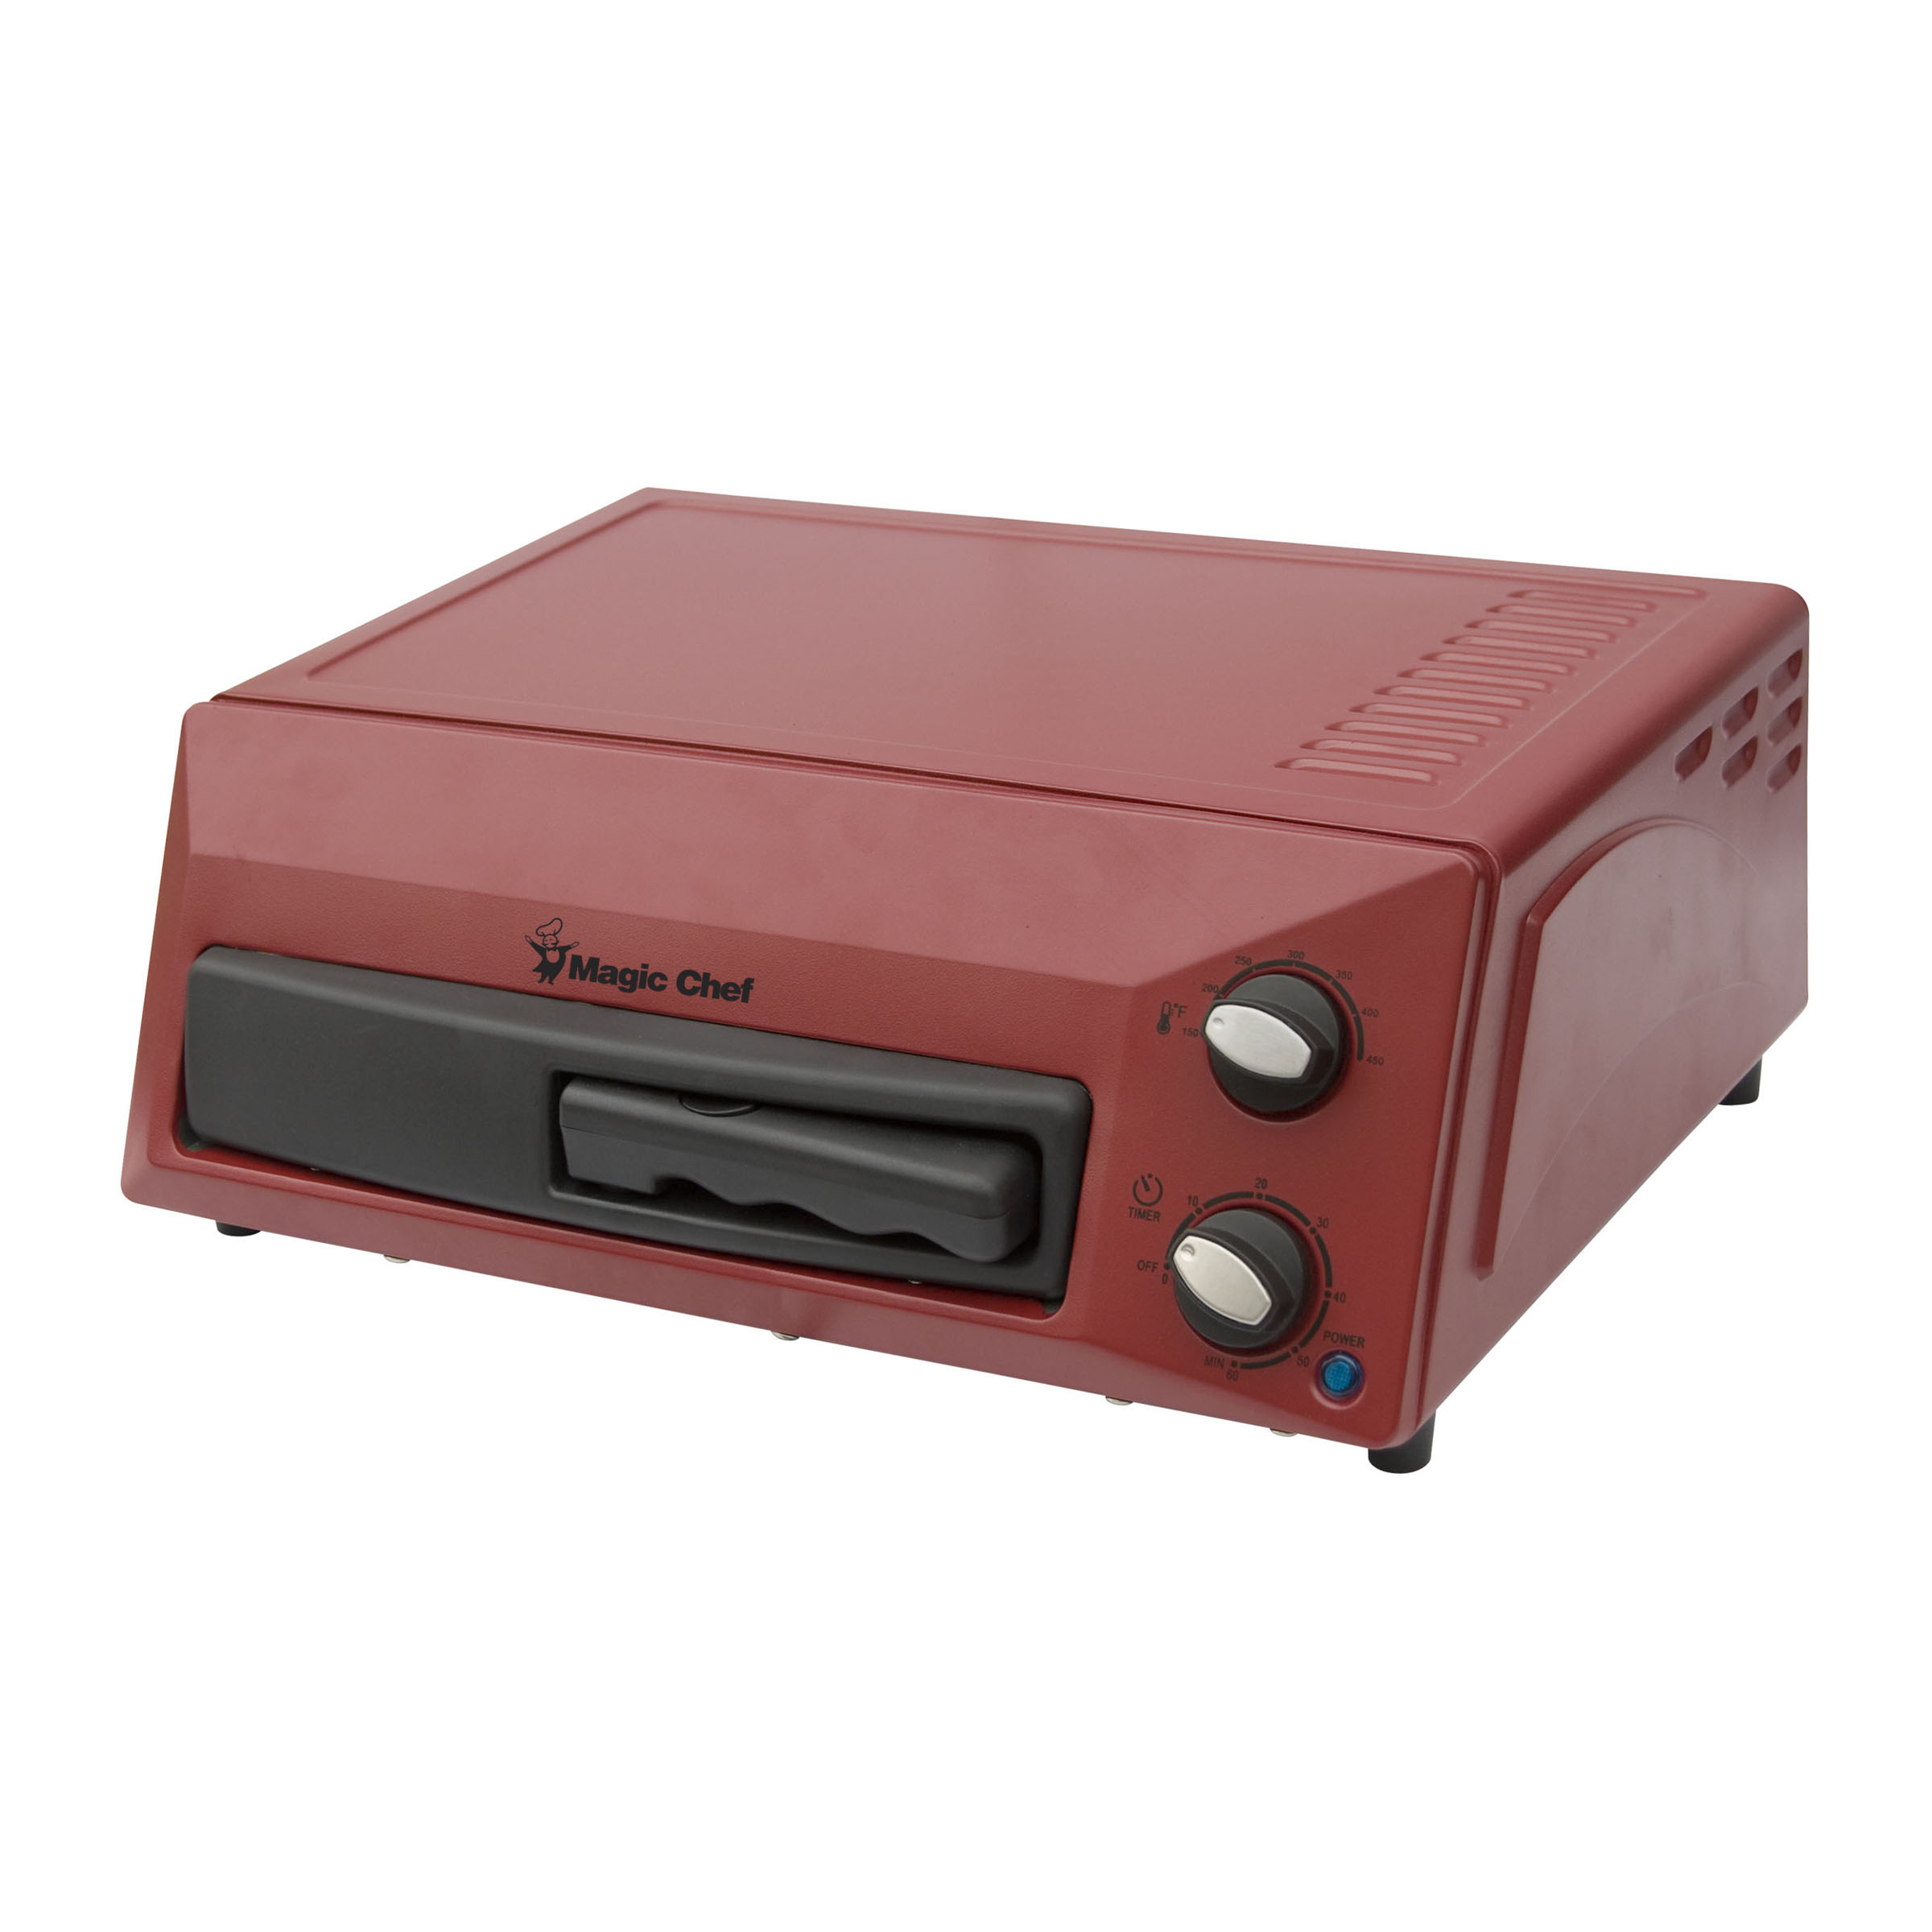 Magic Chef Countertop Pizza Oven in Red